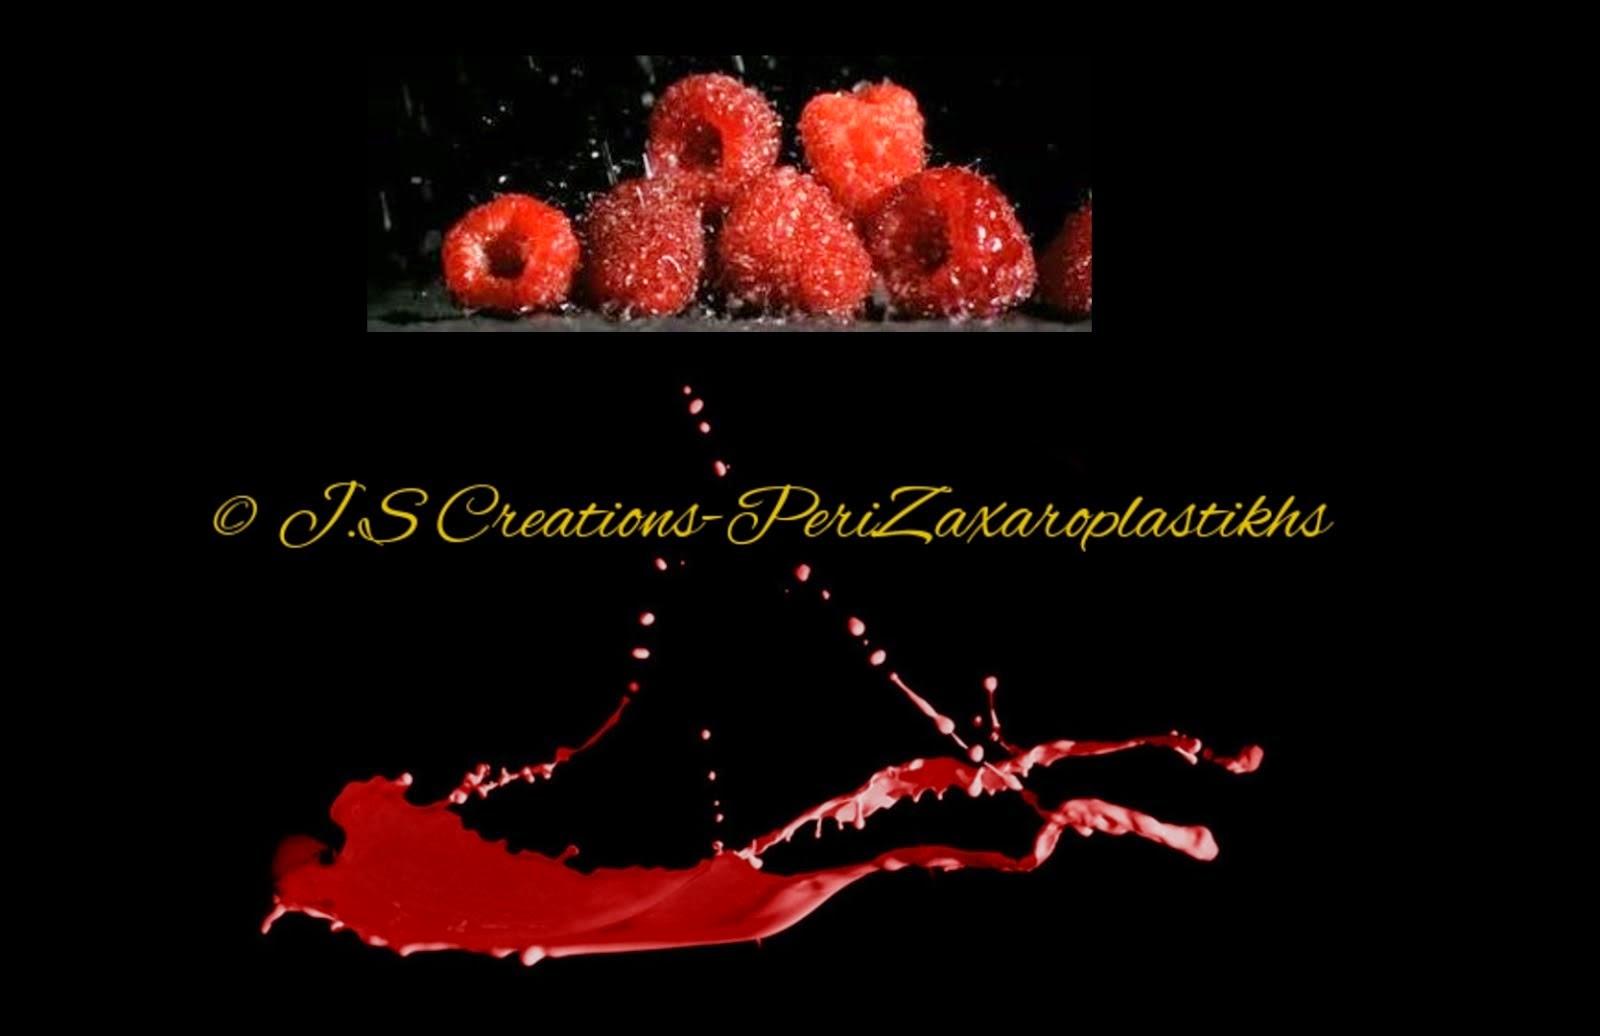 J.S Creations-PeriZaxaroplastikhs